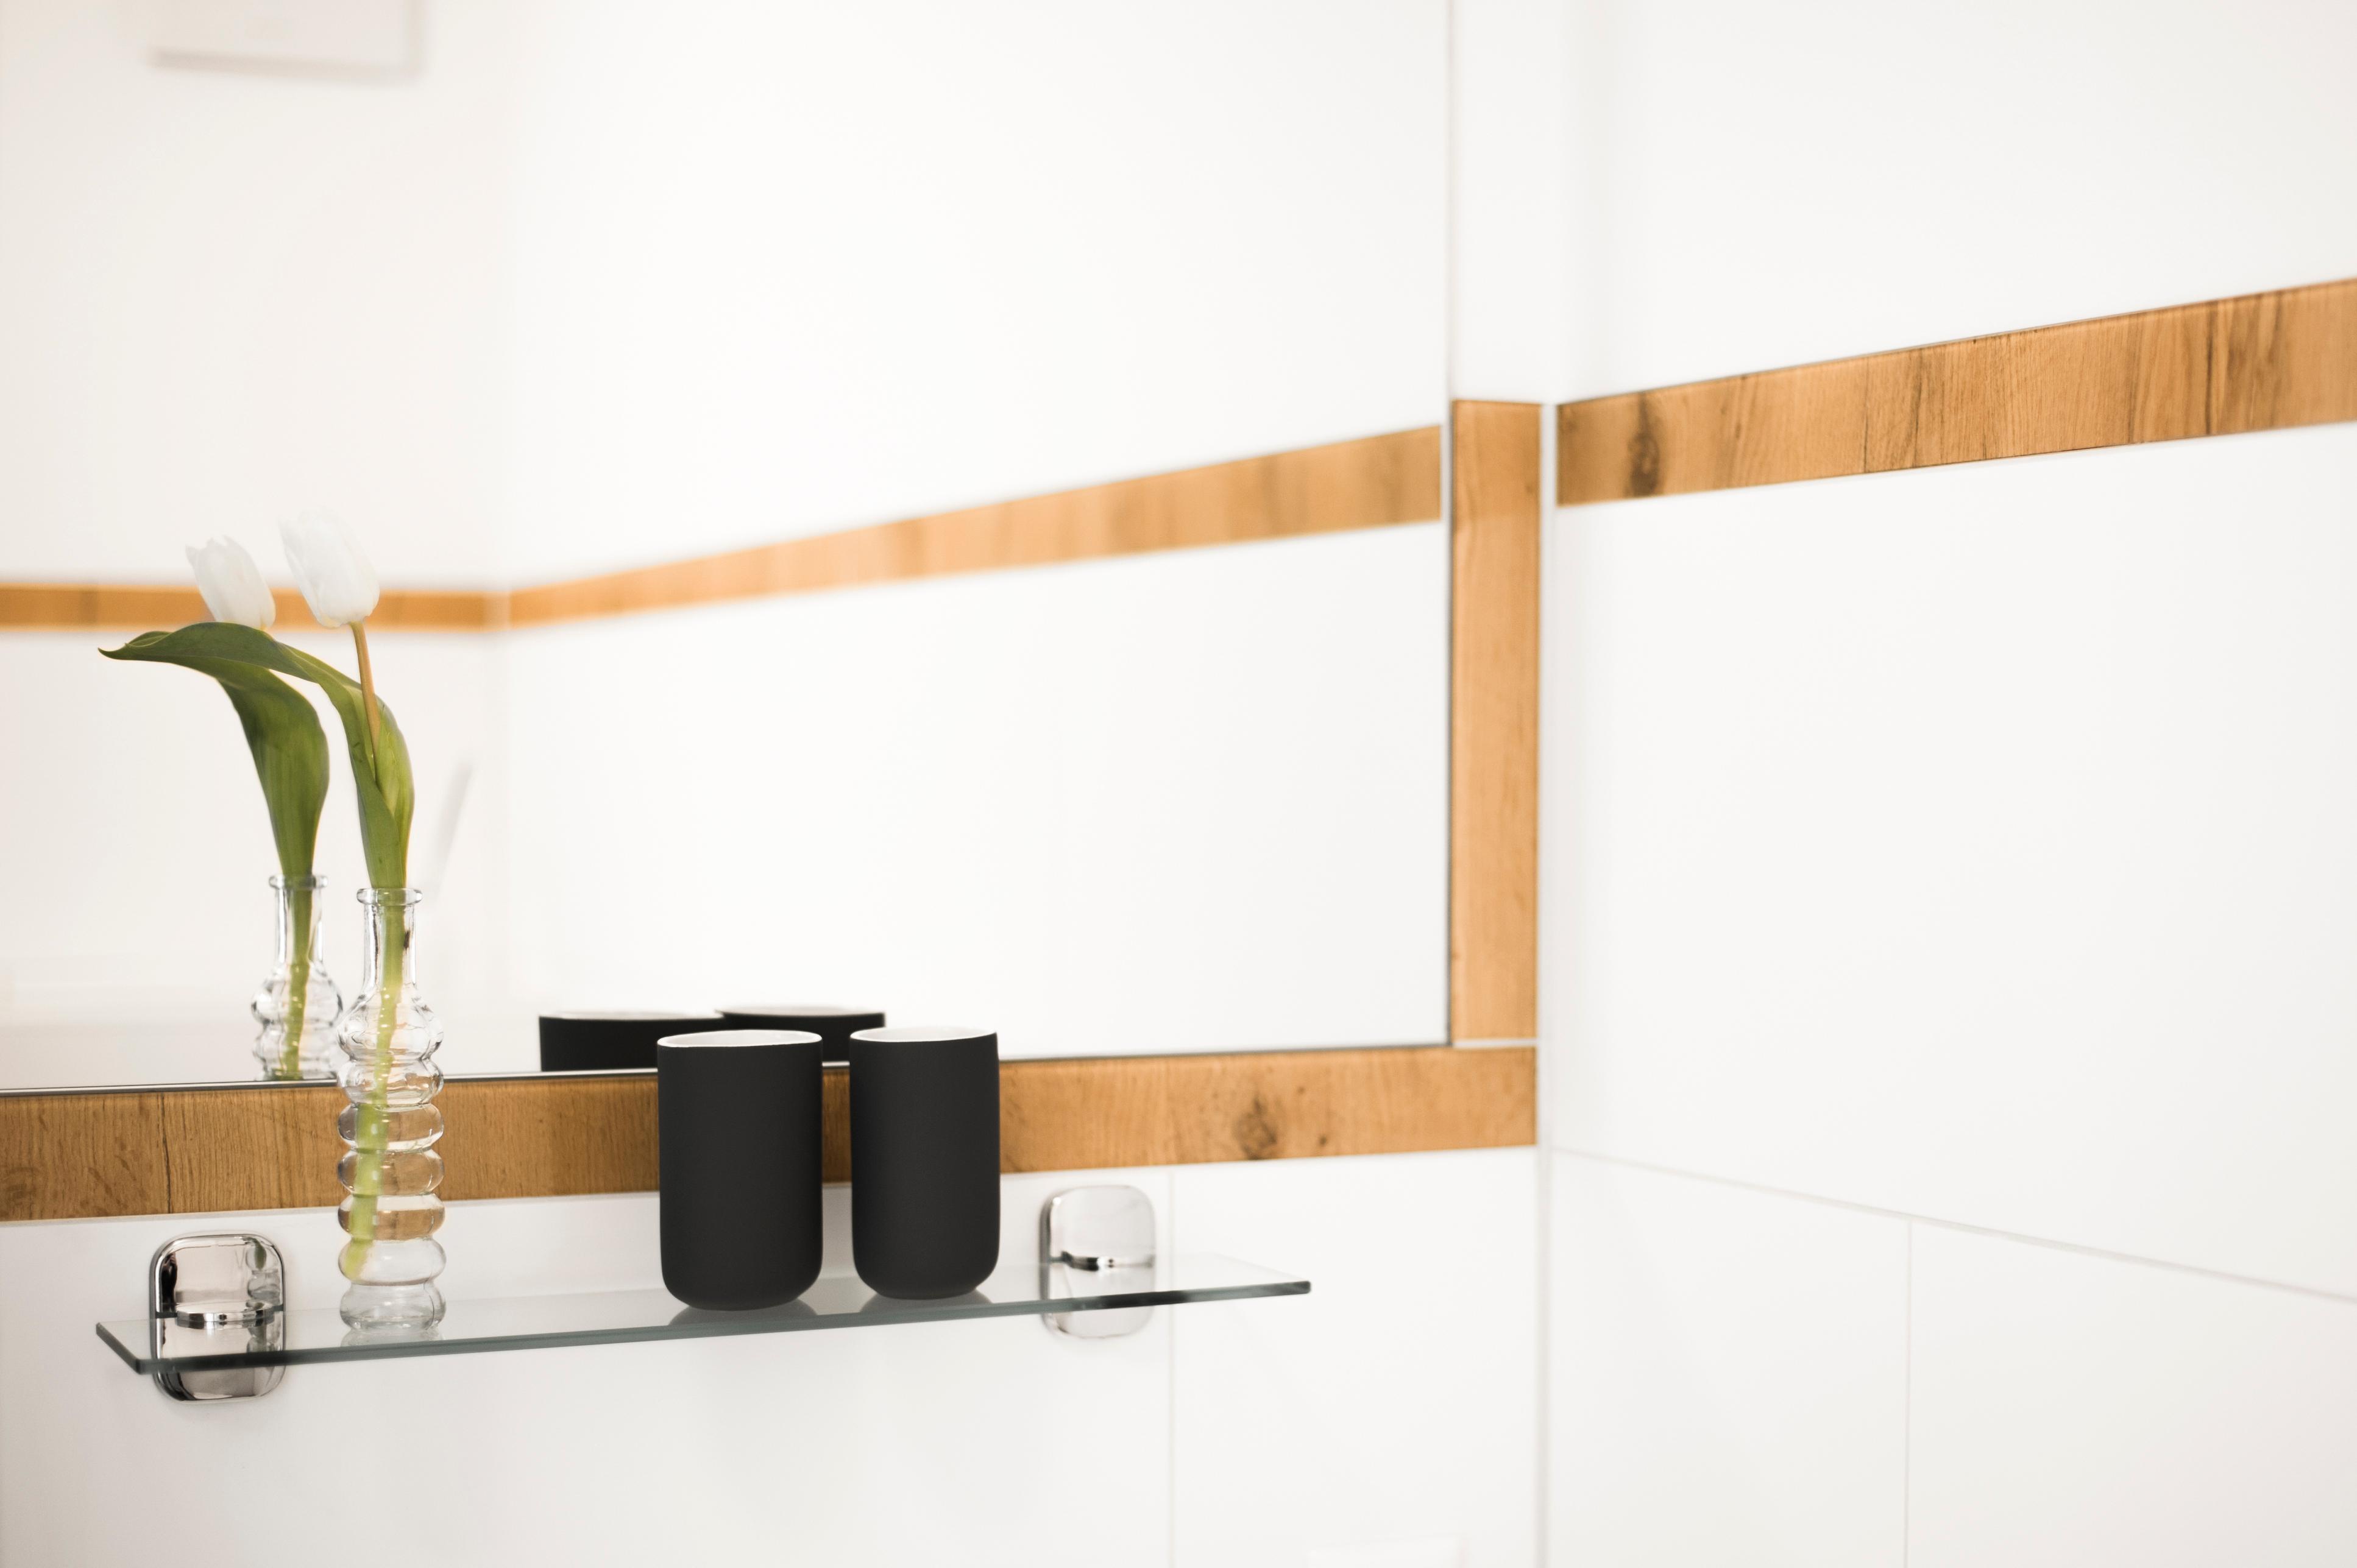 Glas Laminat Badezimmer Mit Eichenoptik Glas Bordüren #badezimmer #laminat  #duschrückwand ©Layerprint.